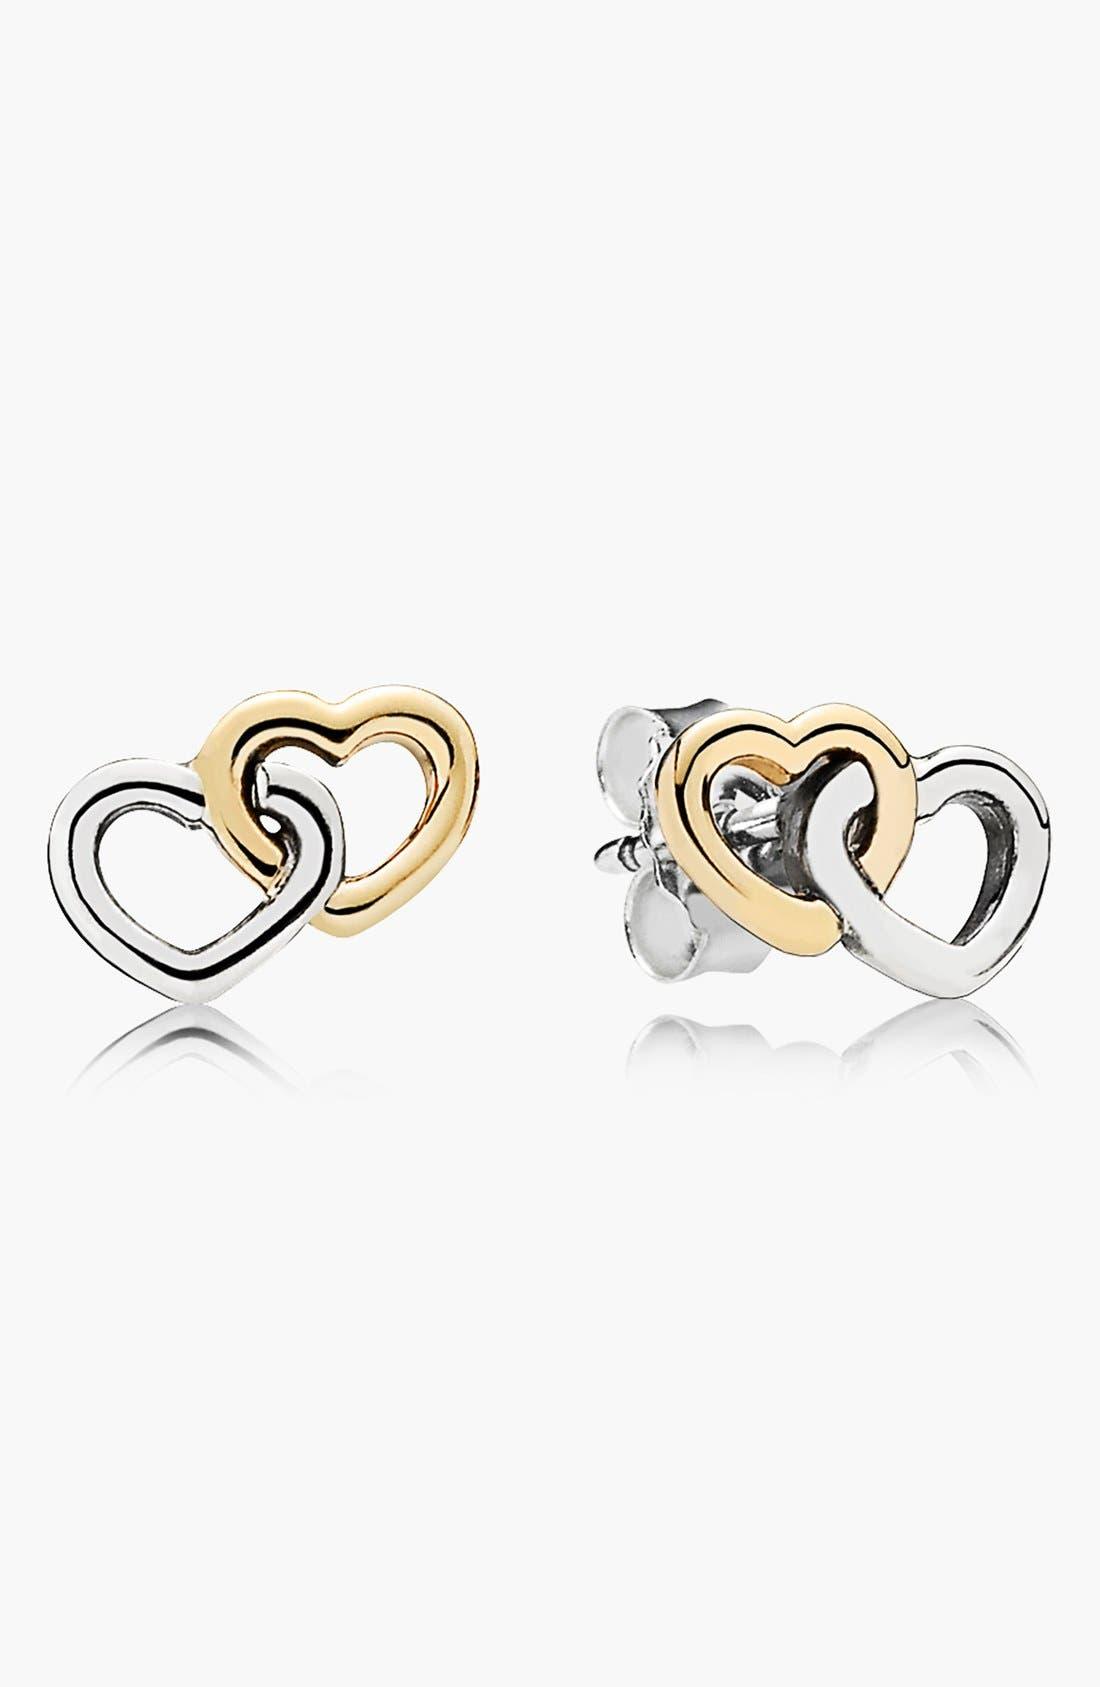 Alternate Image 1 Selected - PANDORA 'Heart to Heart' Stud Earrings